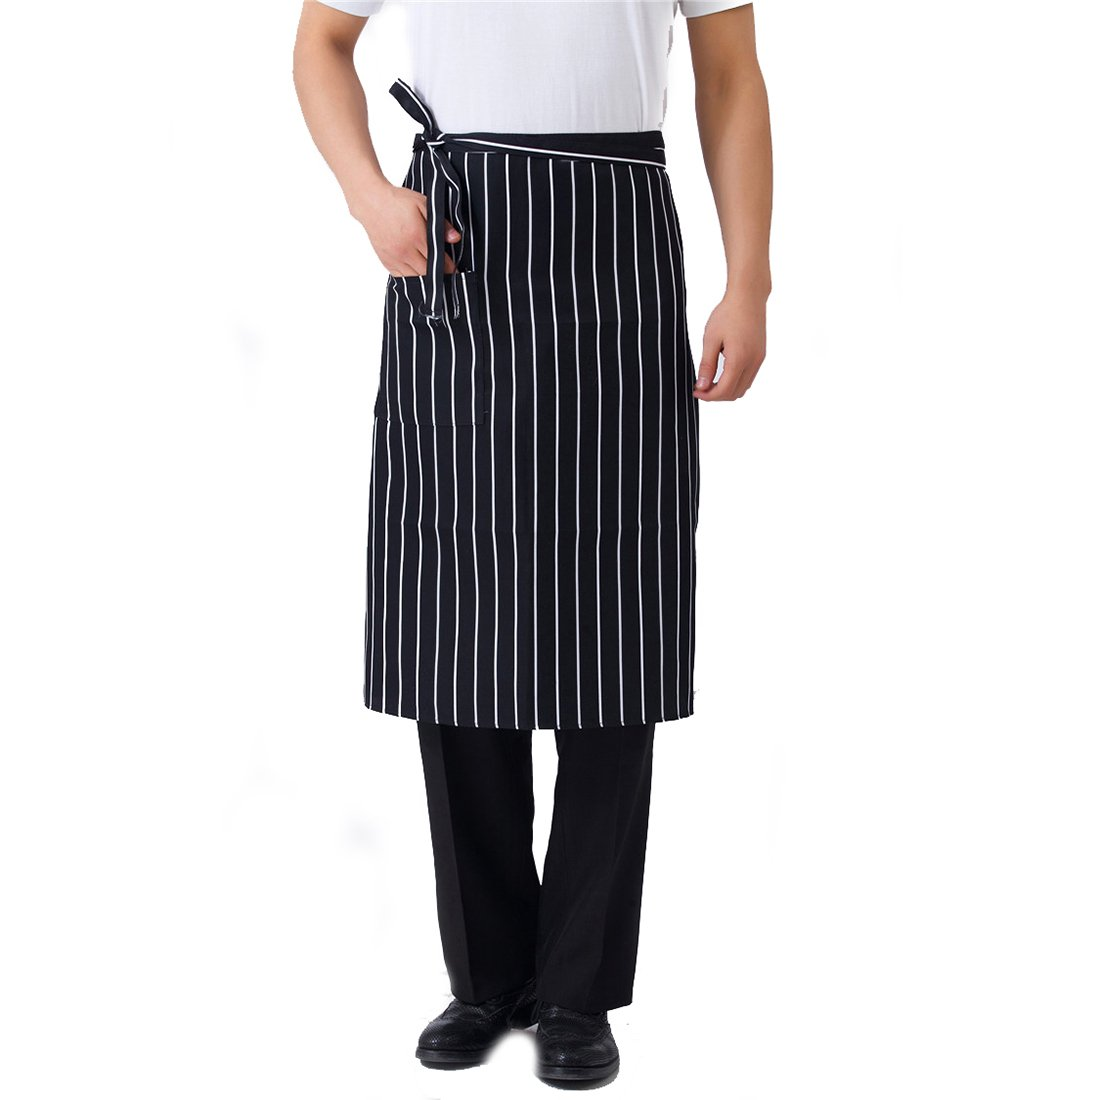 Lissomplume Grembiule da chef